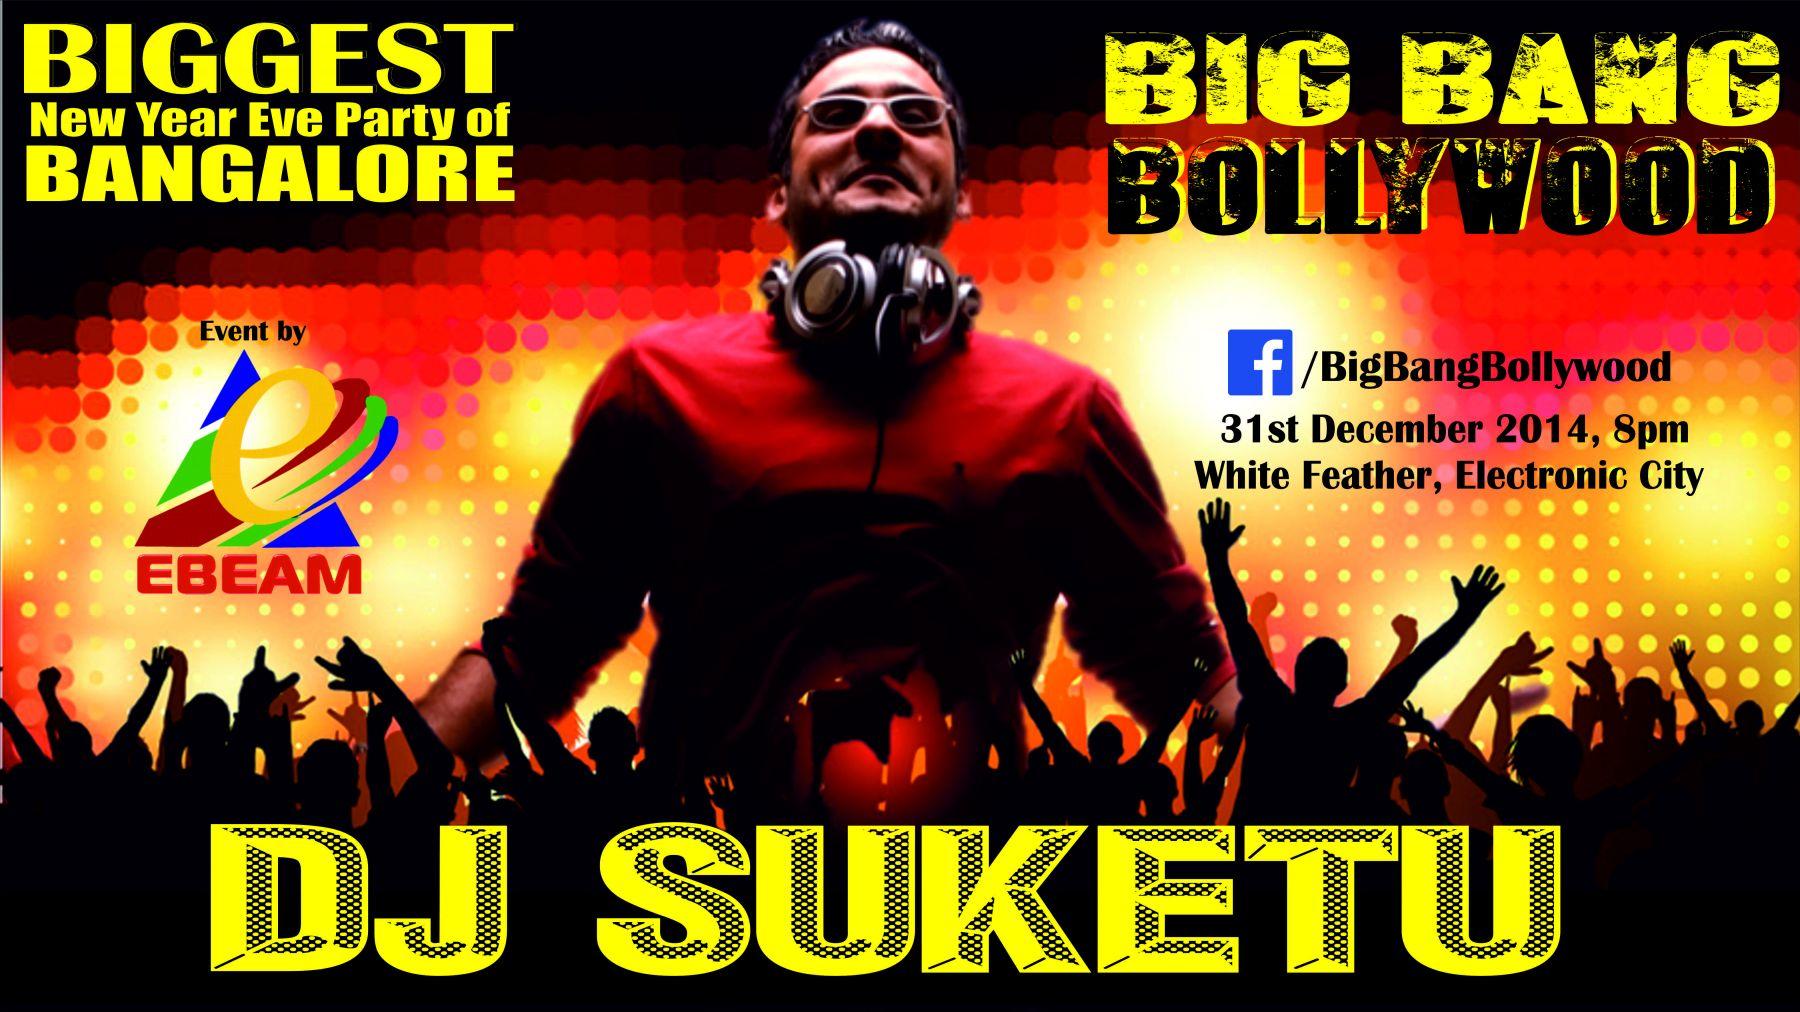 Big_bang_bollywood_with_dj_suketu